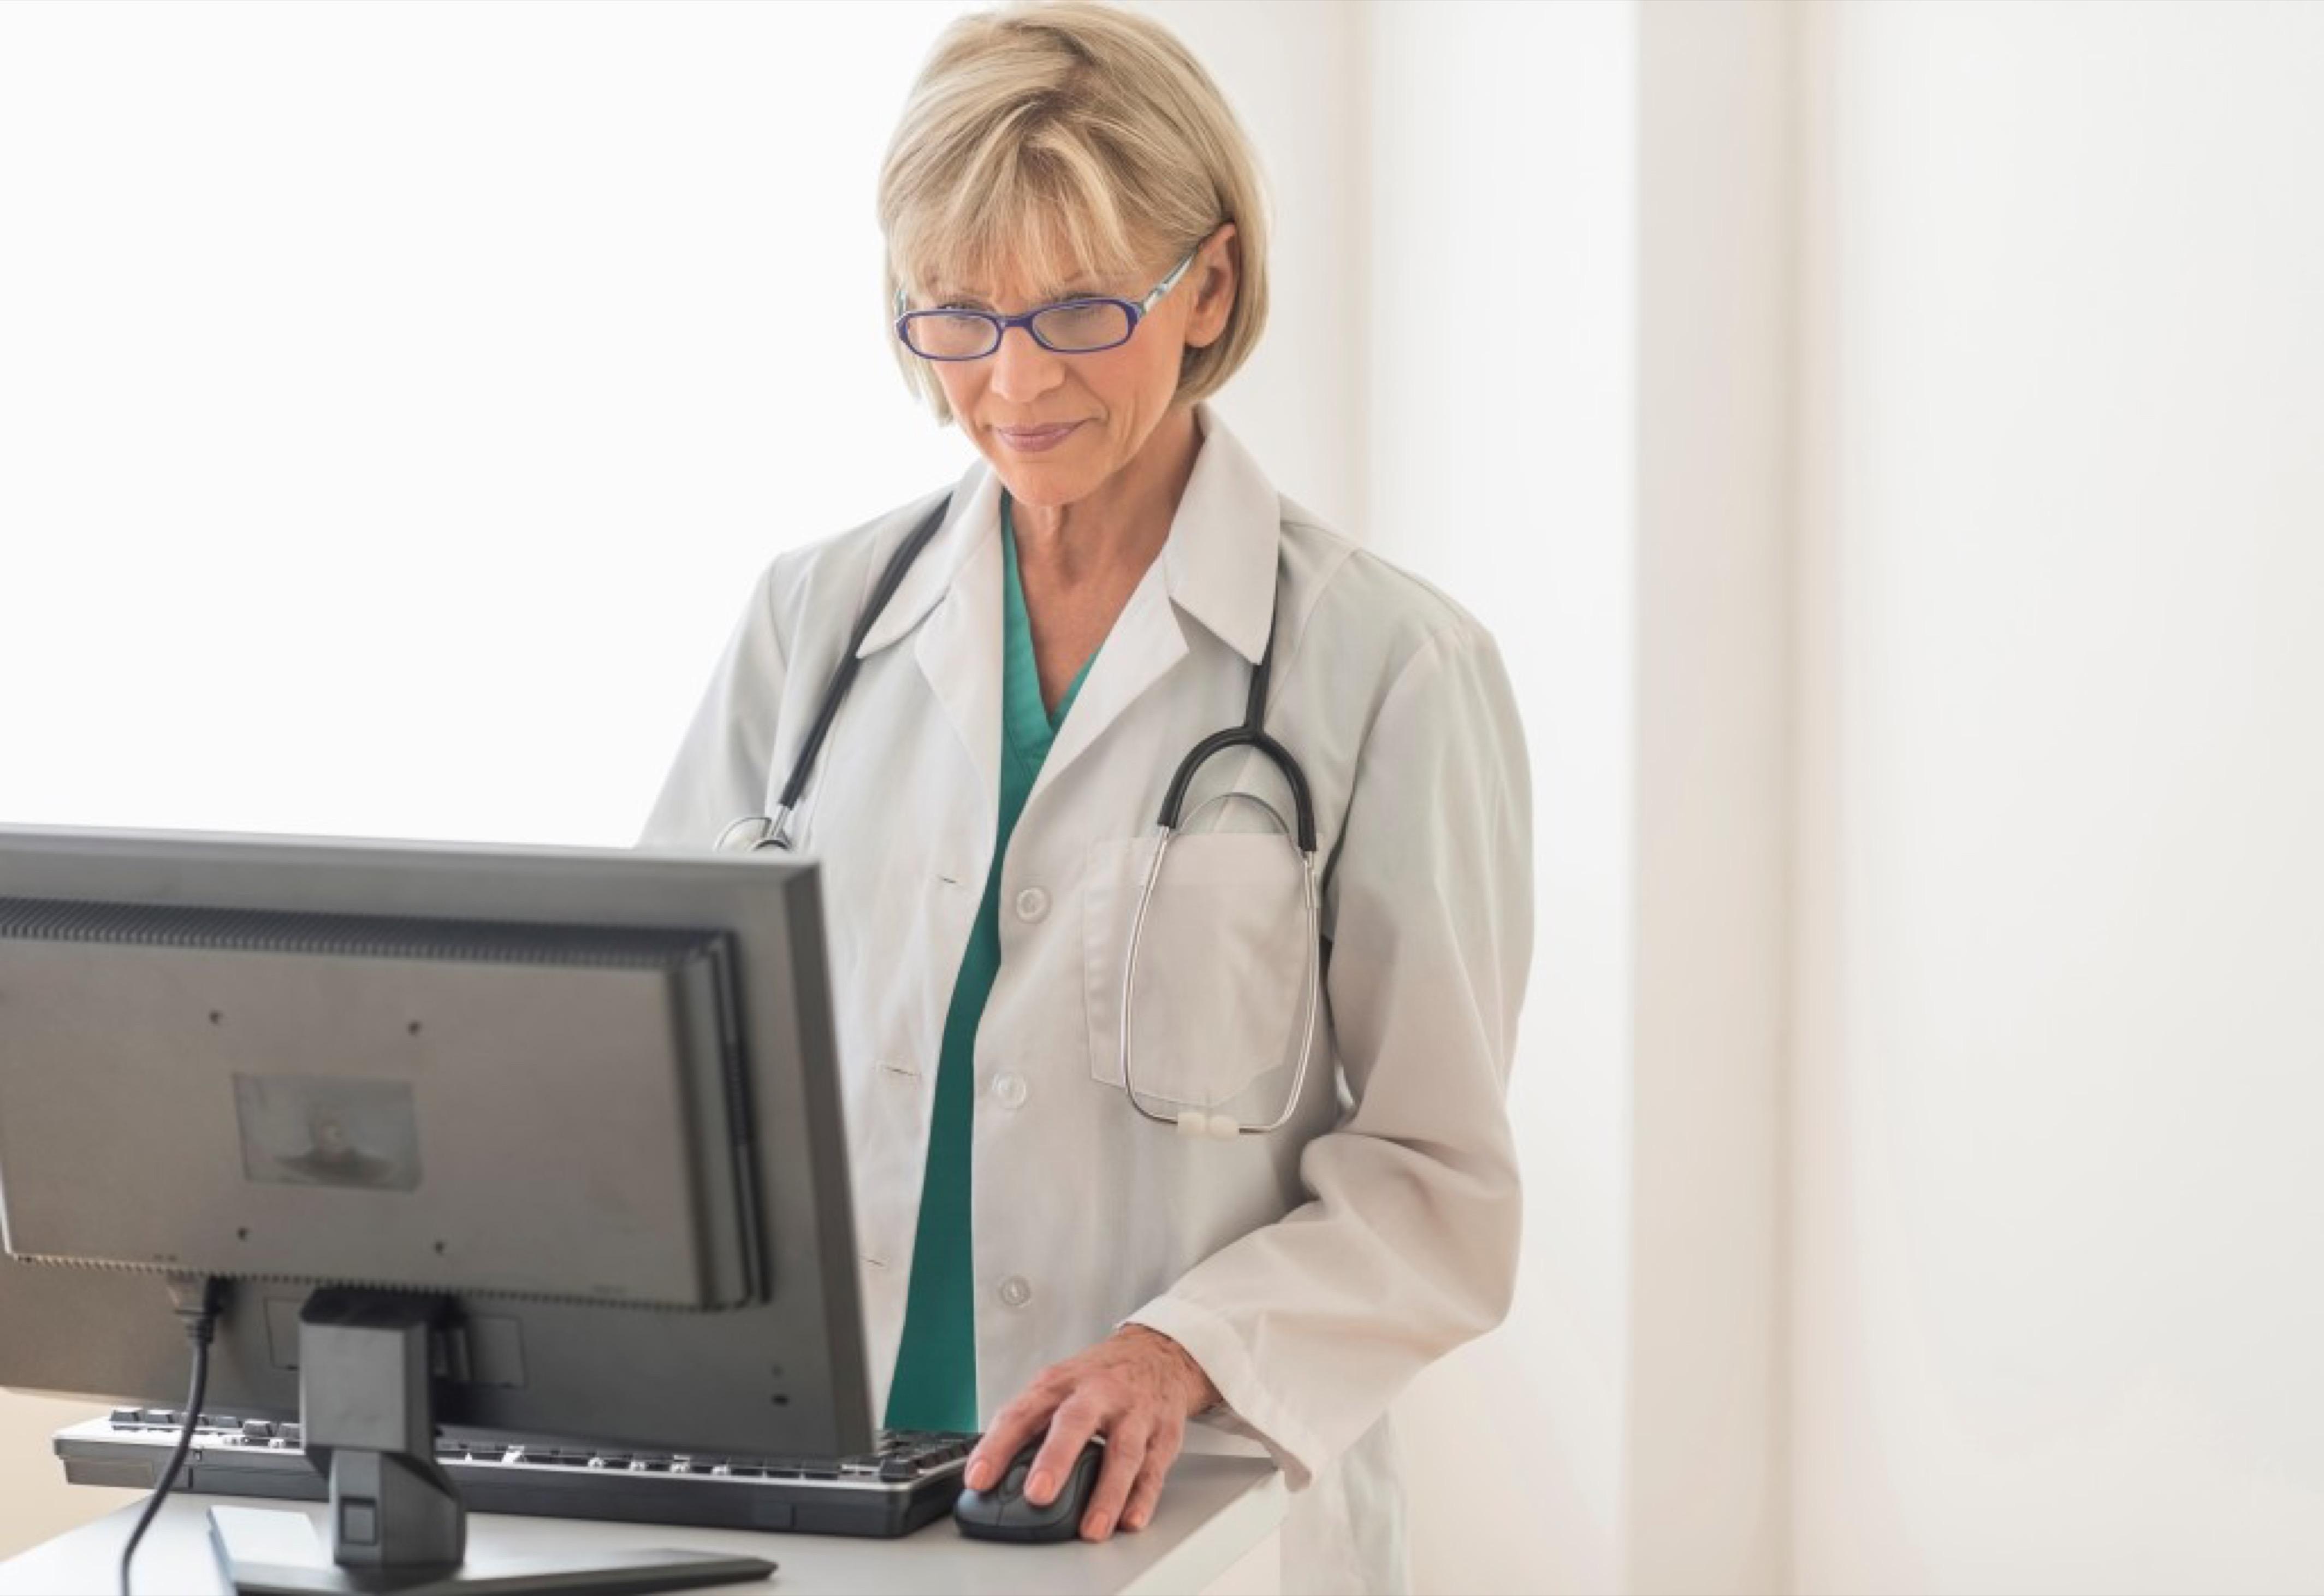 Mature female doctor using desktop PC at desk in hospital